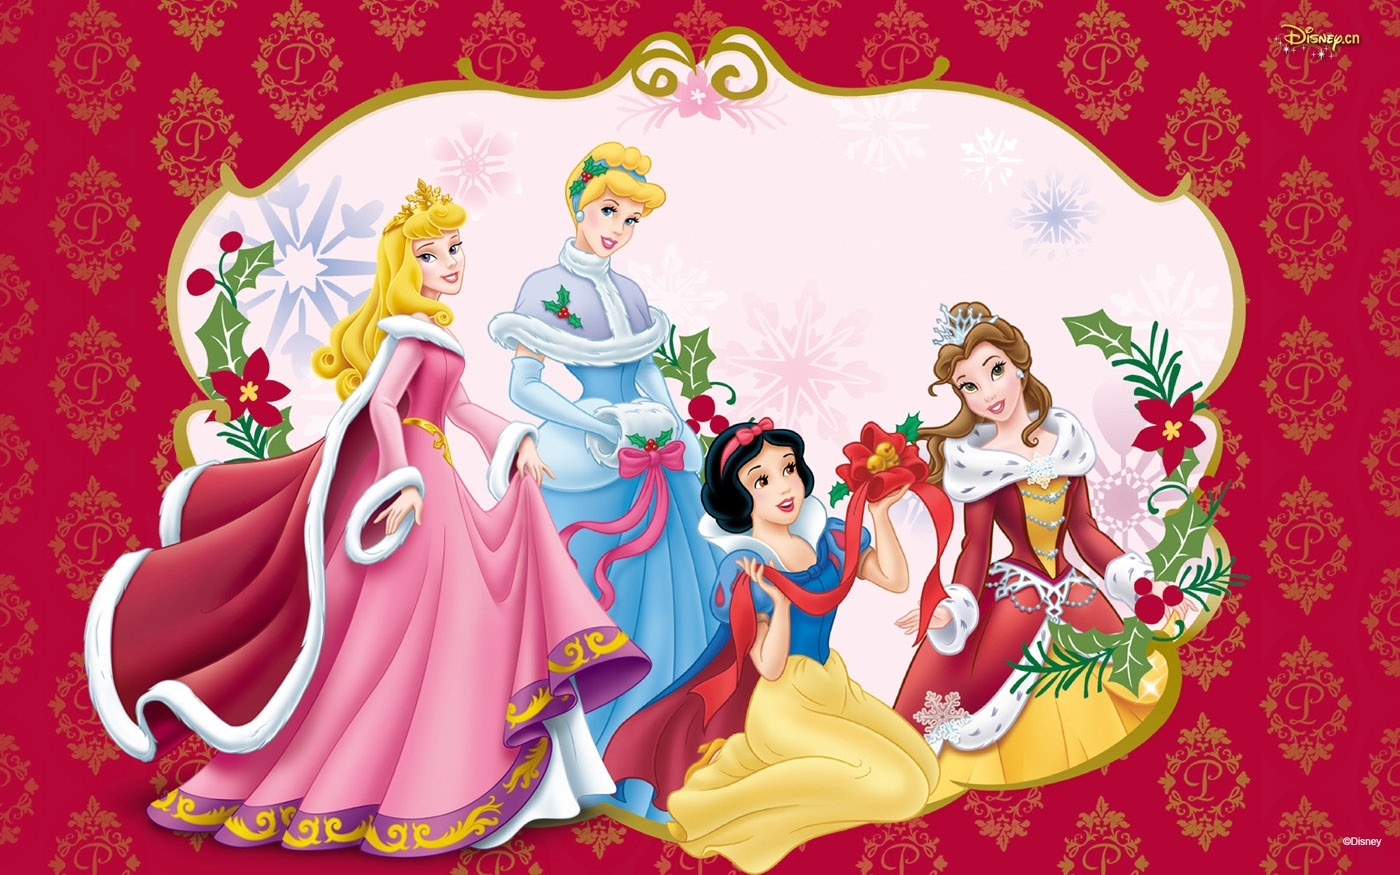 Title Disney Princess 24960 Cartoon Illustration Wallpapers Dimension 1400 X 875 File Type JPG JPEG